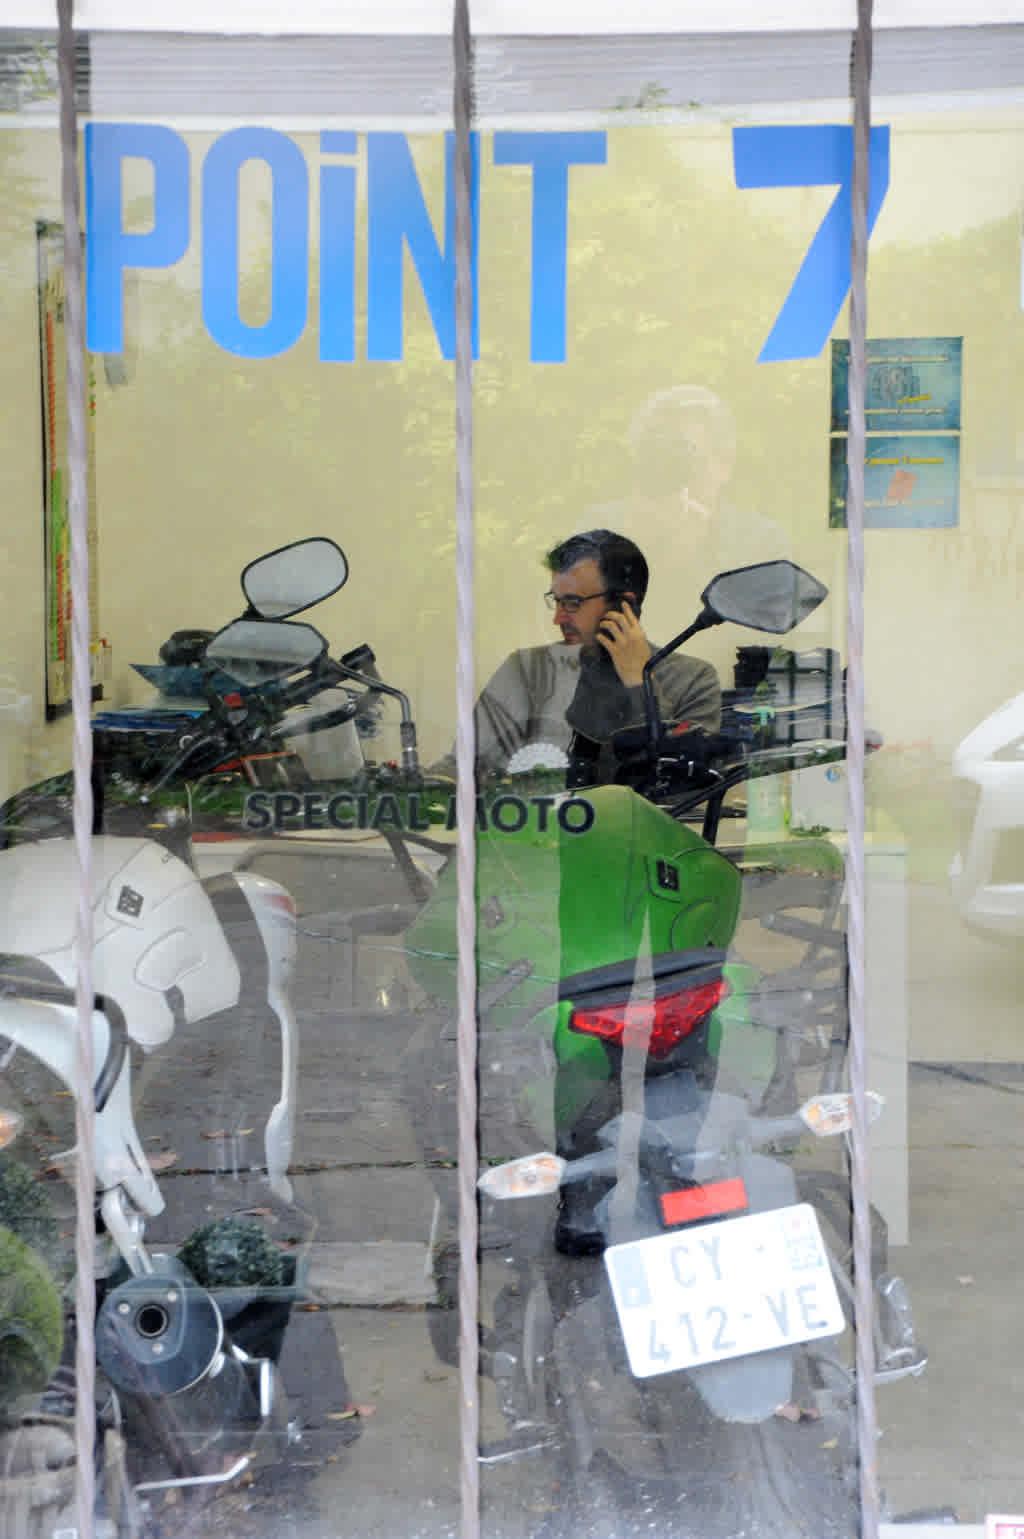 Point 7 Auto-moto - BEZONS